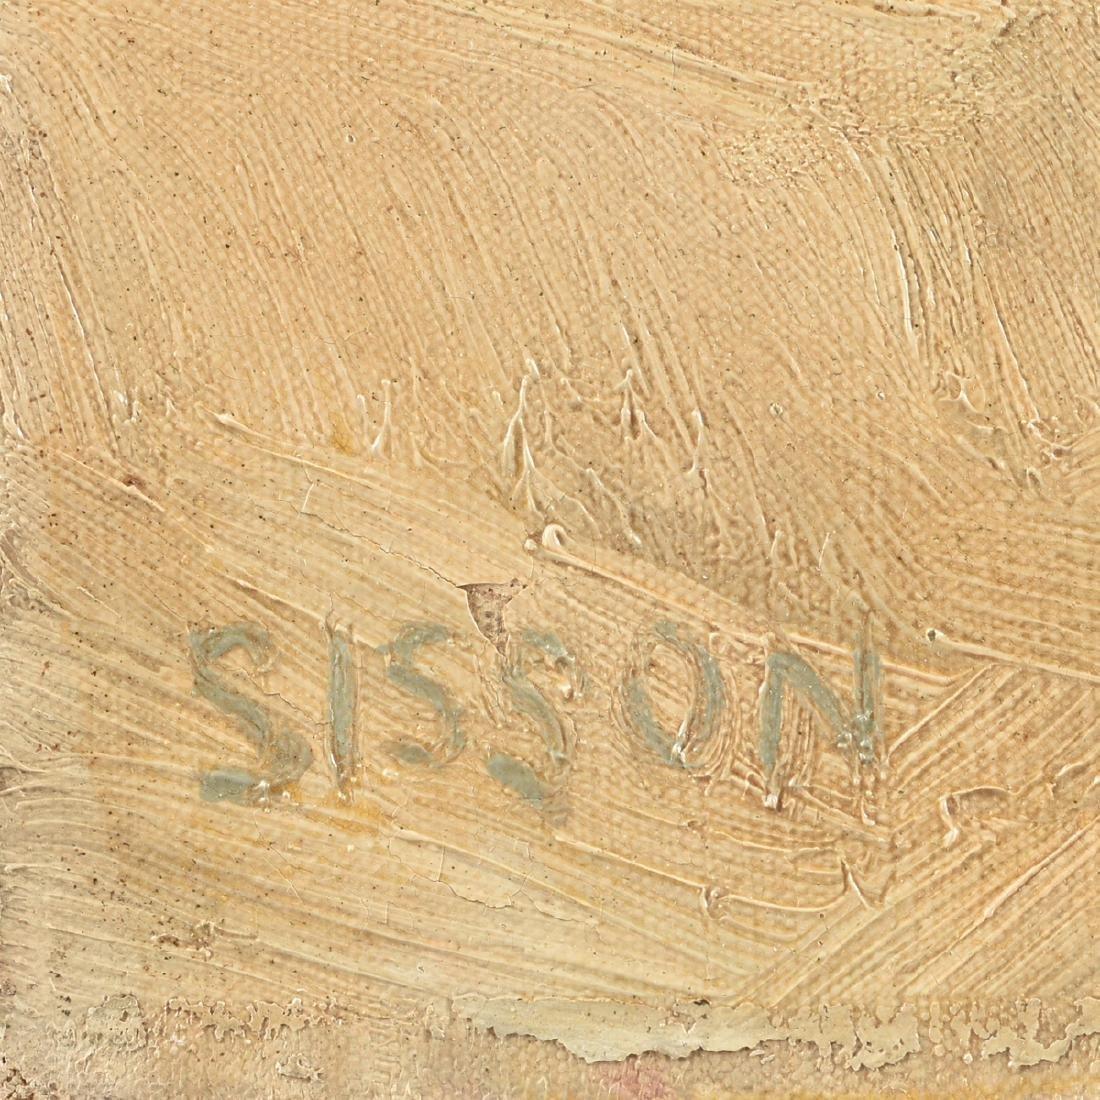 FREDERICK RHODES SISSON (American 1893-1962) A - 3